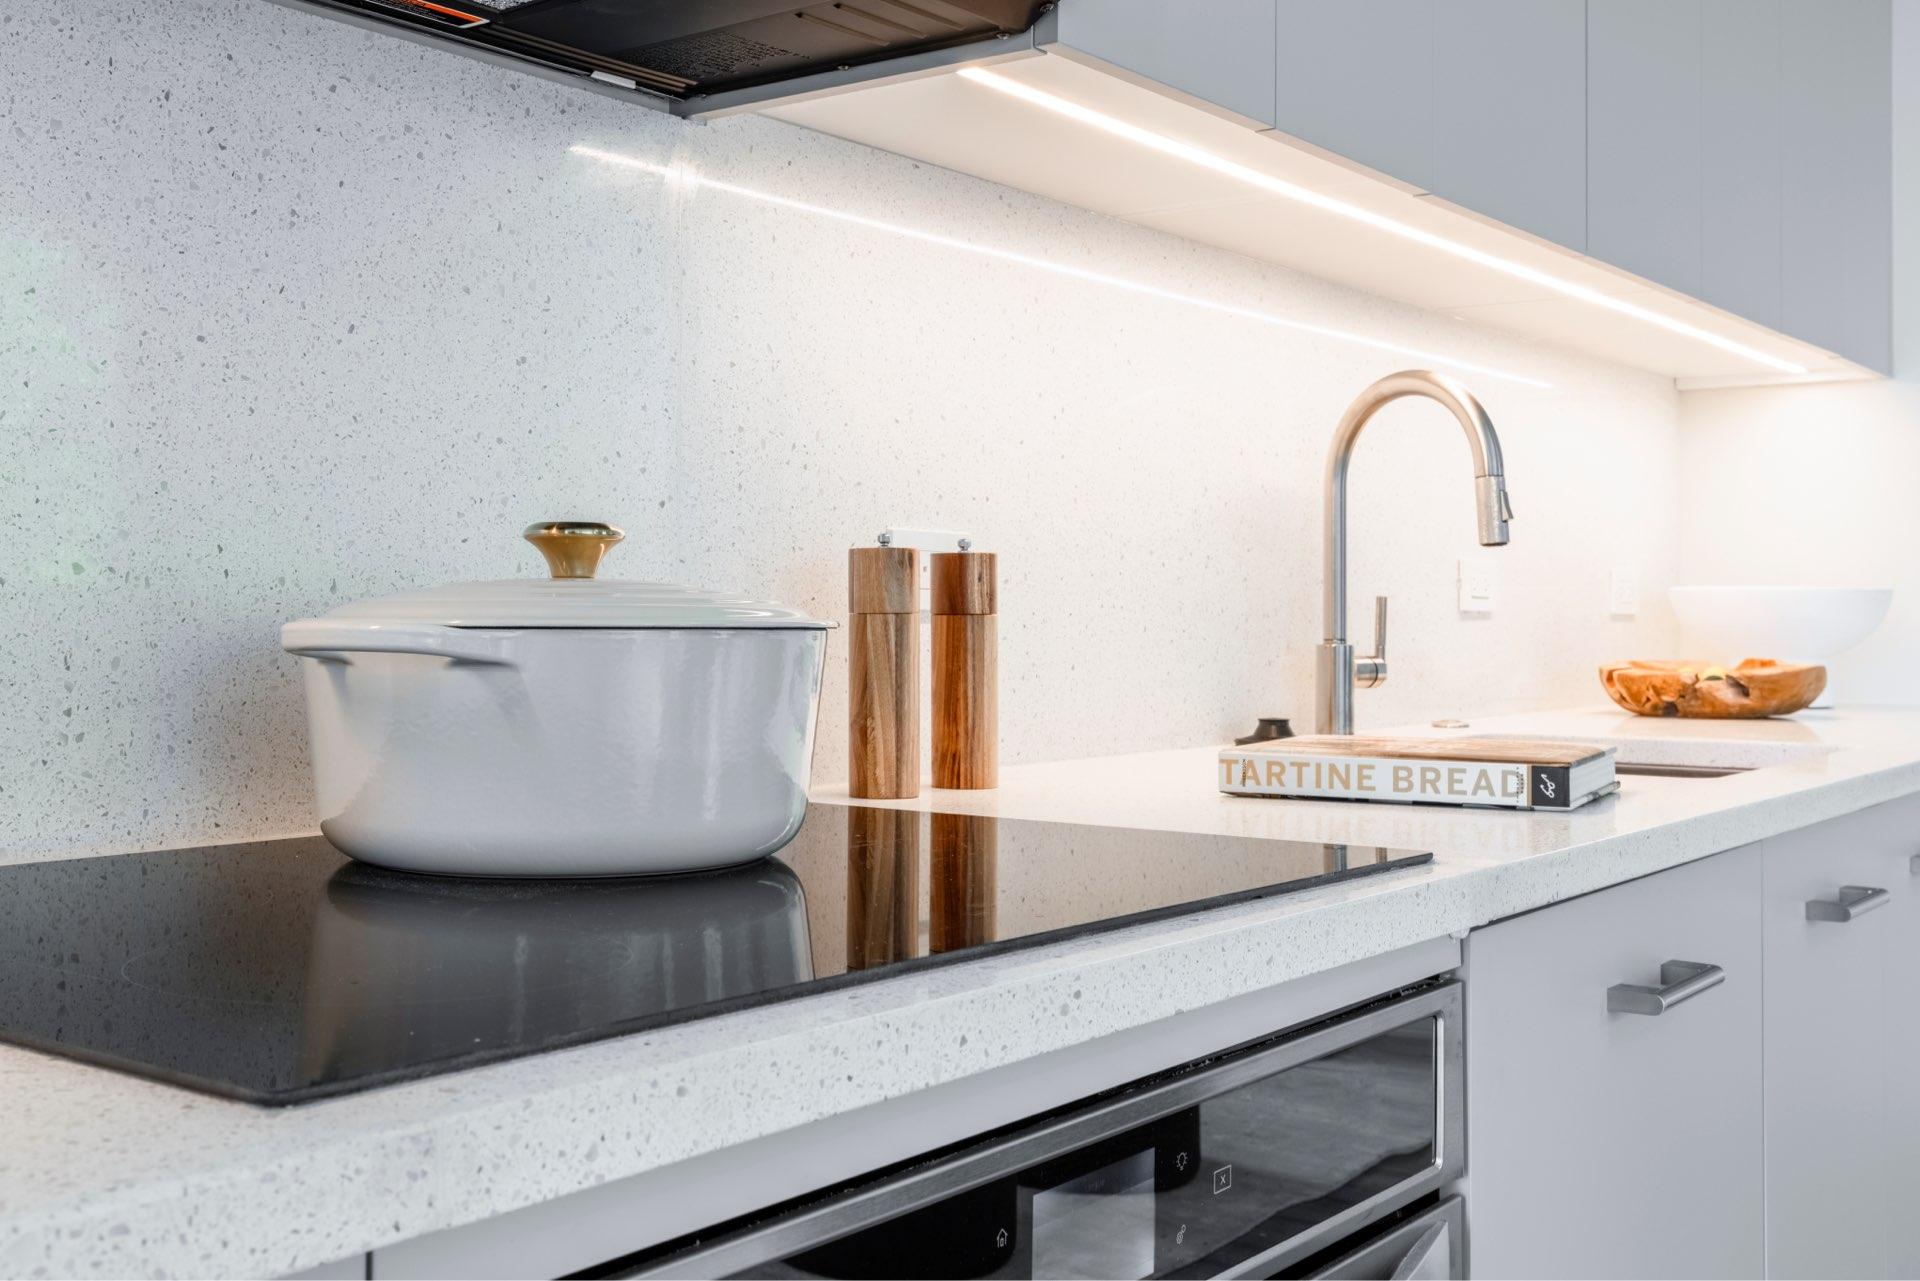 Full-sized Miele/Bosch/Whirlpool kitchen appliances